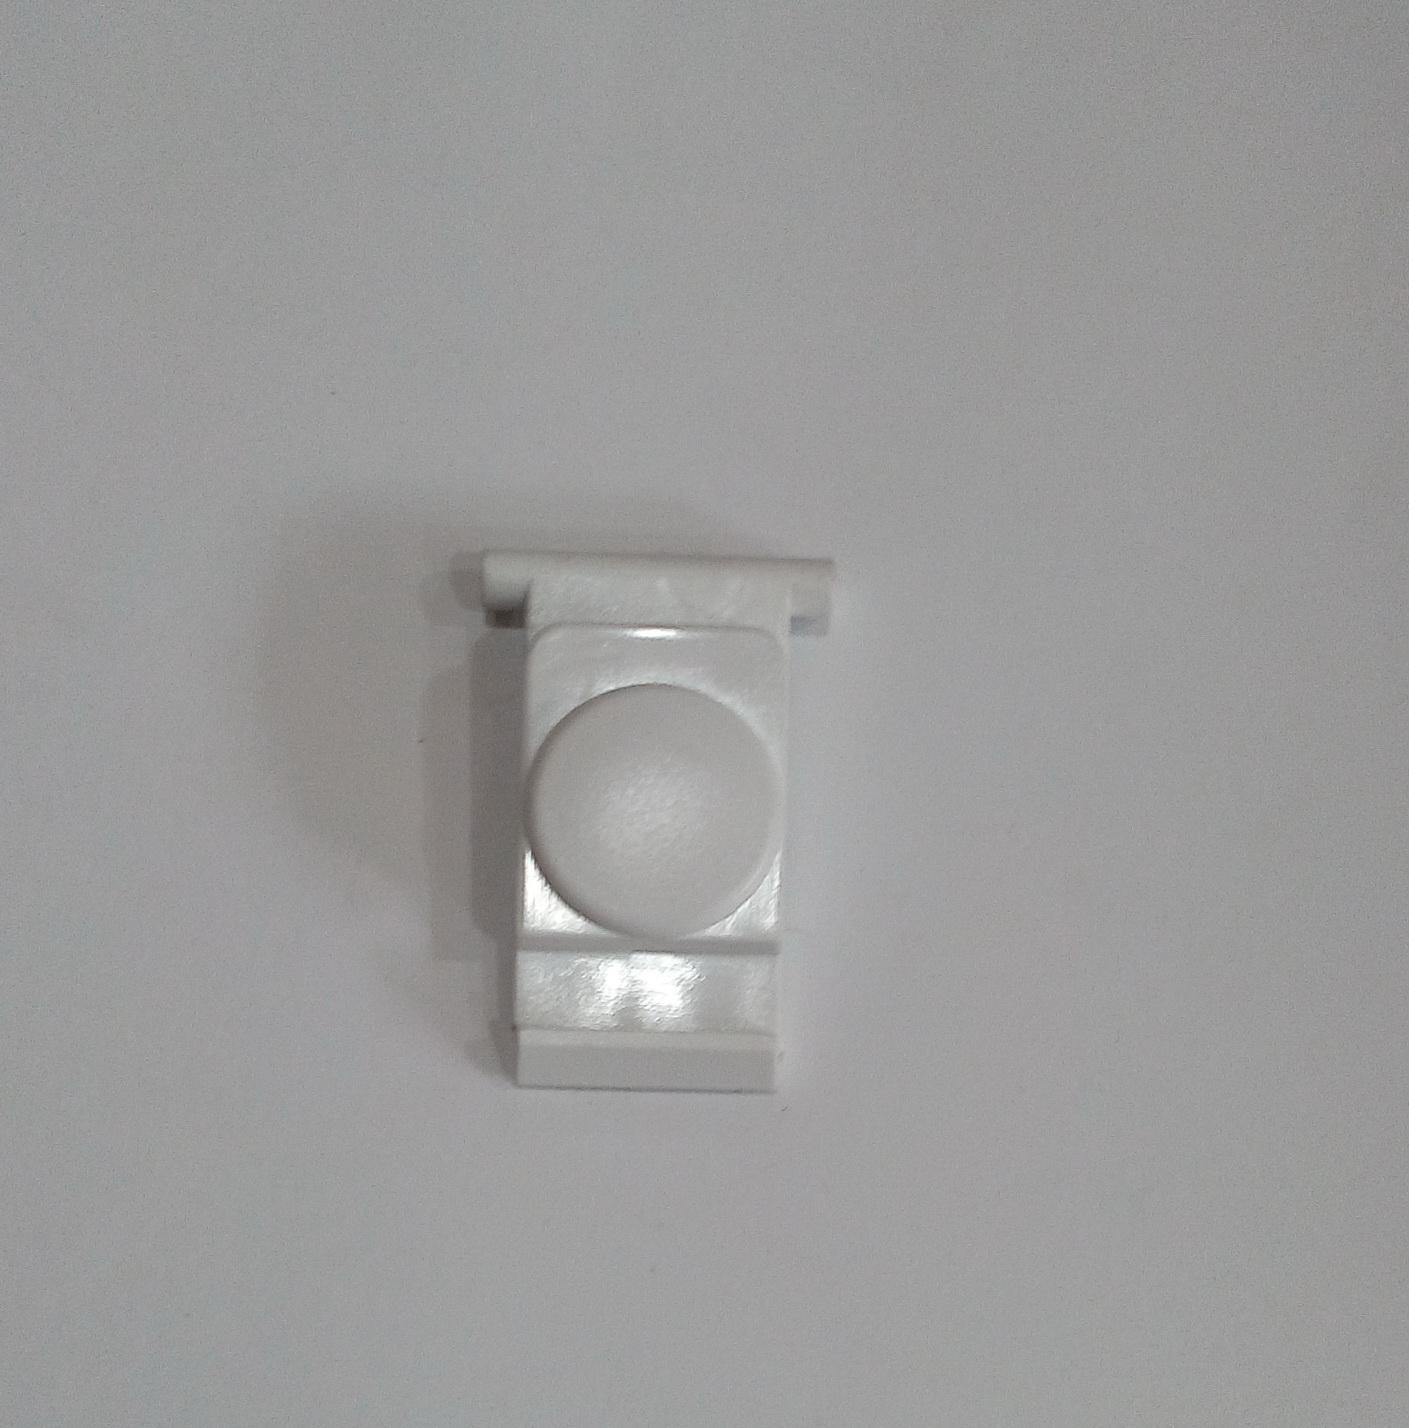 قفل جارو شارژی پارس خزر  به رنگ سفید مدل  HVC-411, HVC-311, CVC-121